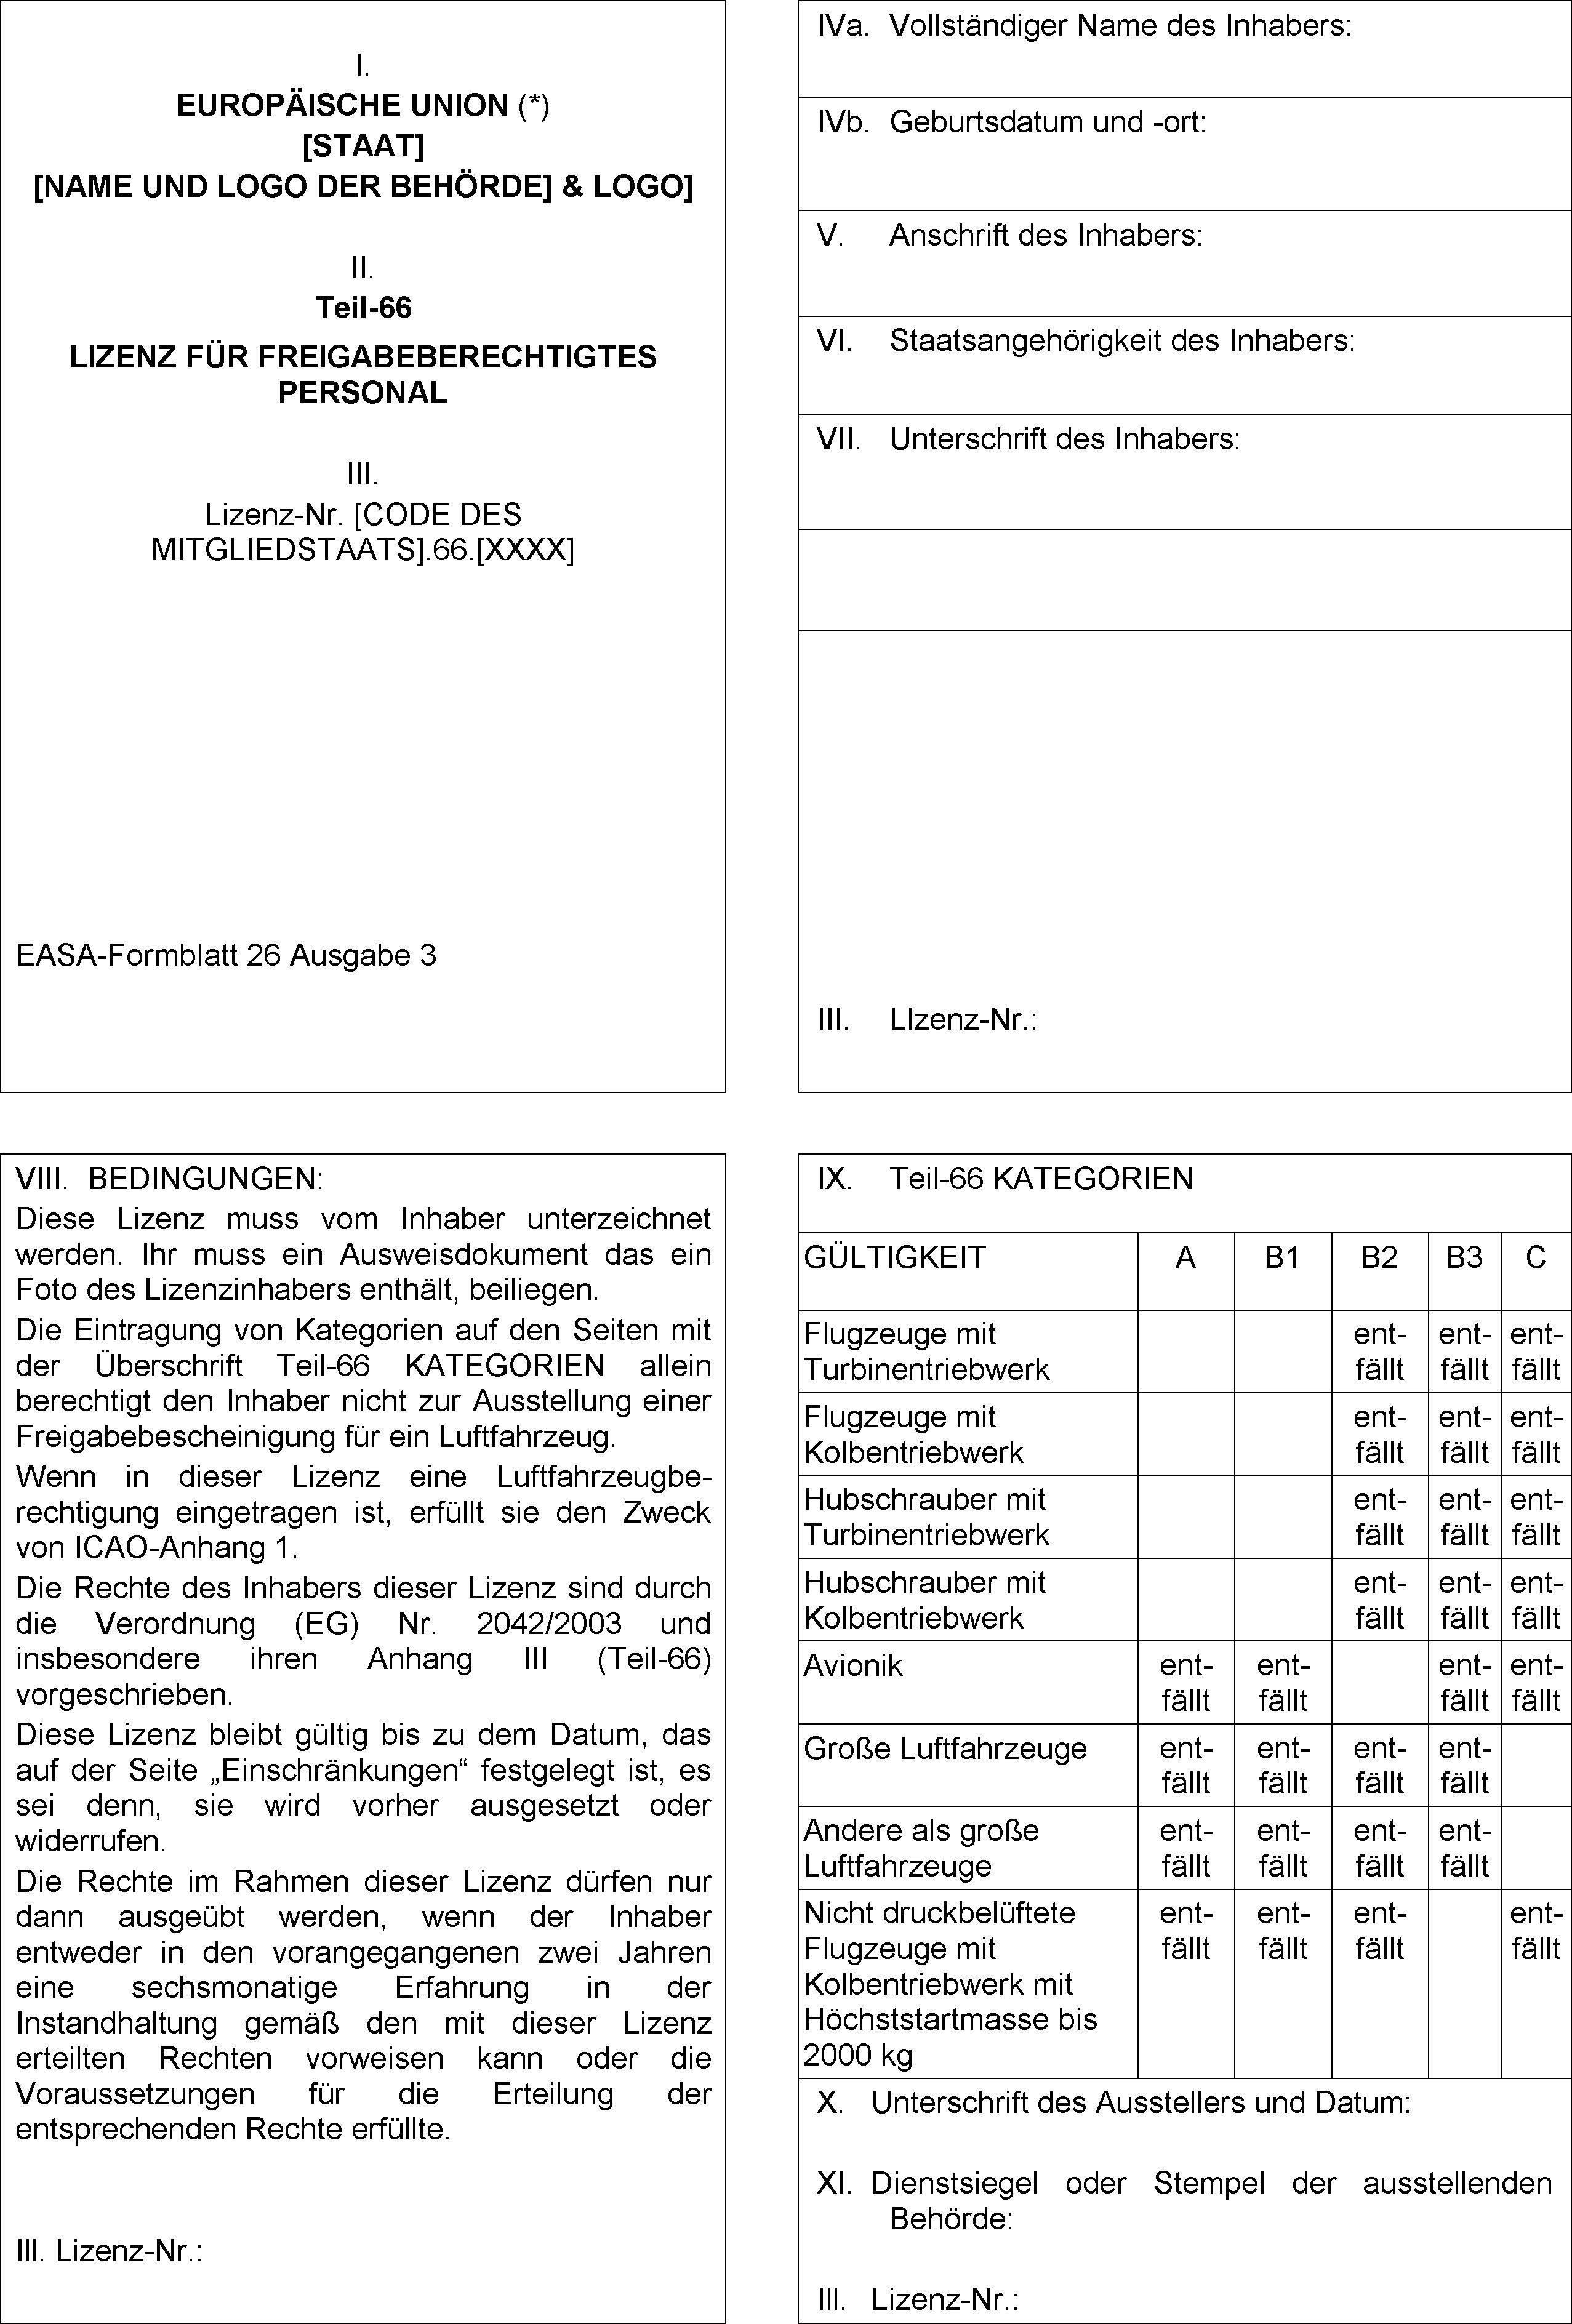 EUR-Lex - 02014R1321-20150727 - EN - EUR-Lex